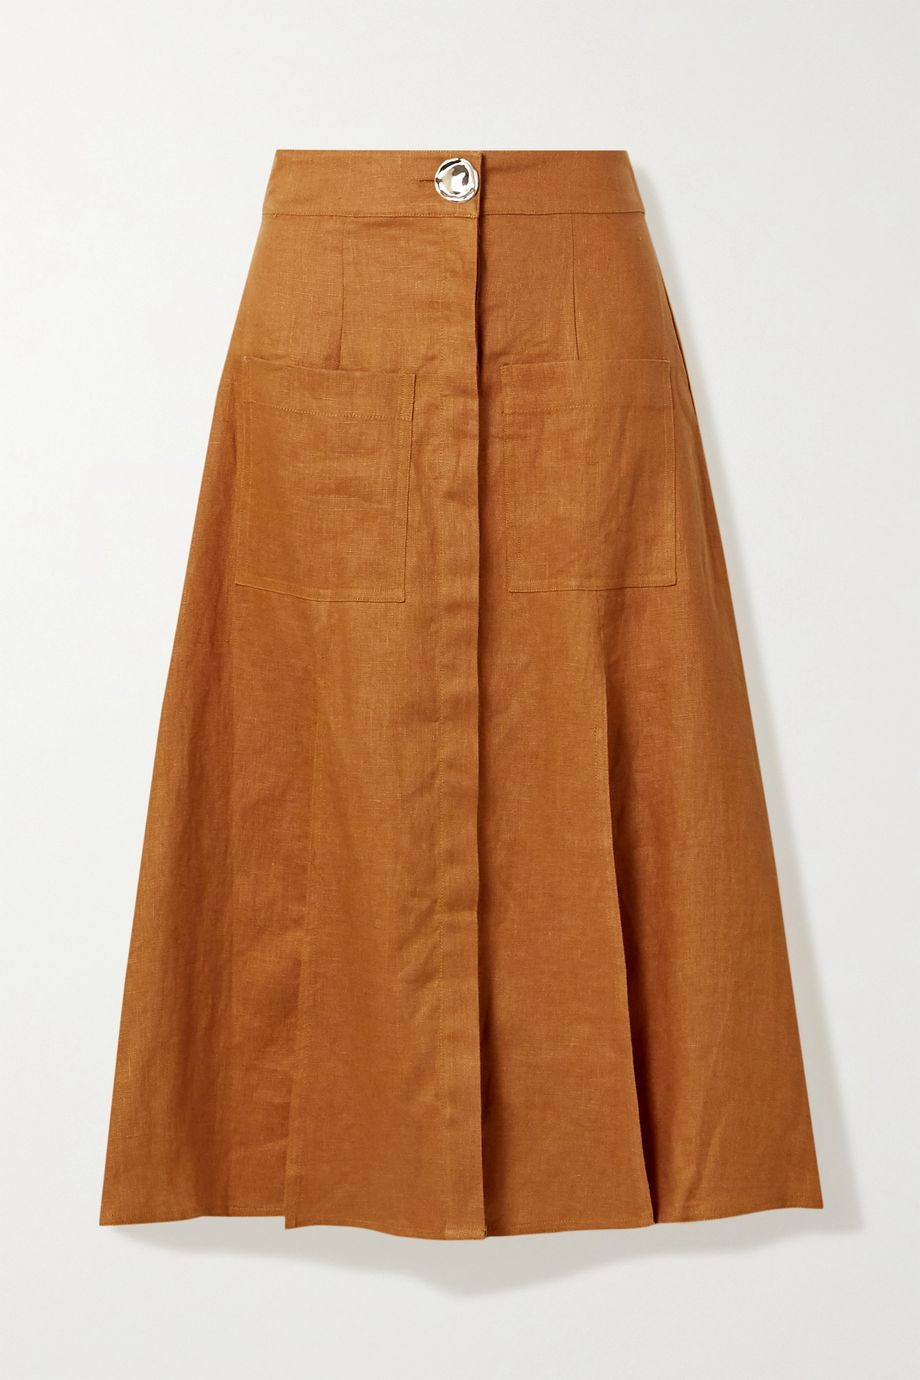 NICHOLAS Masala linen midi skirt